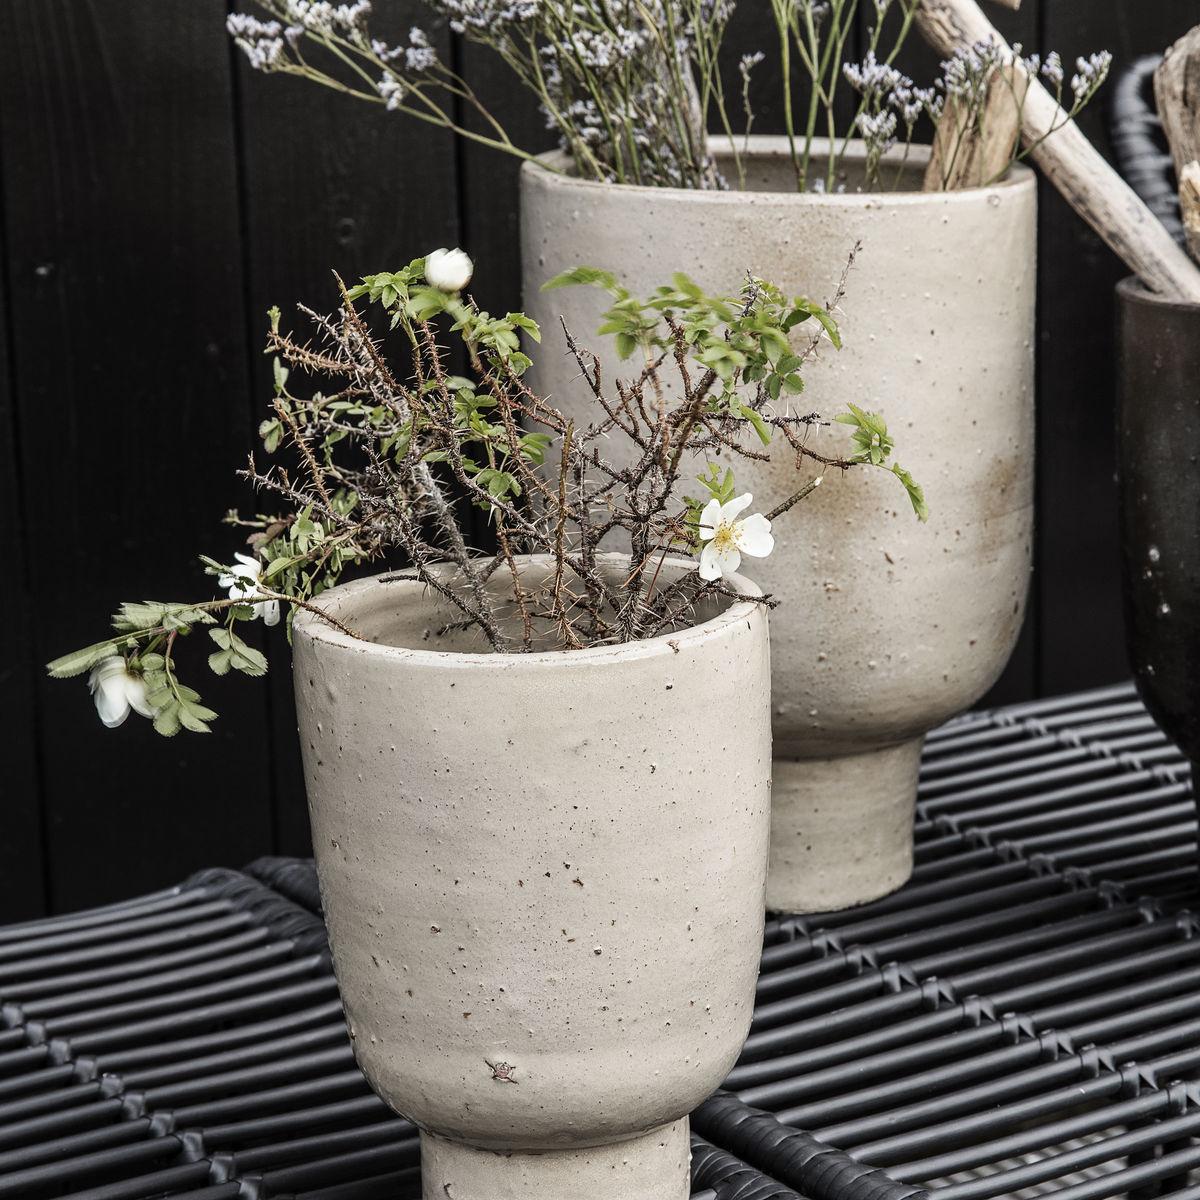 clay planter in beige